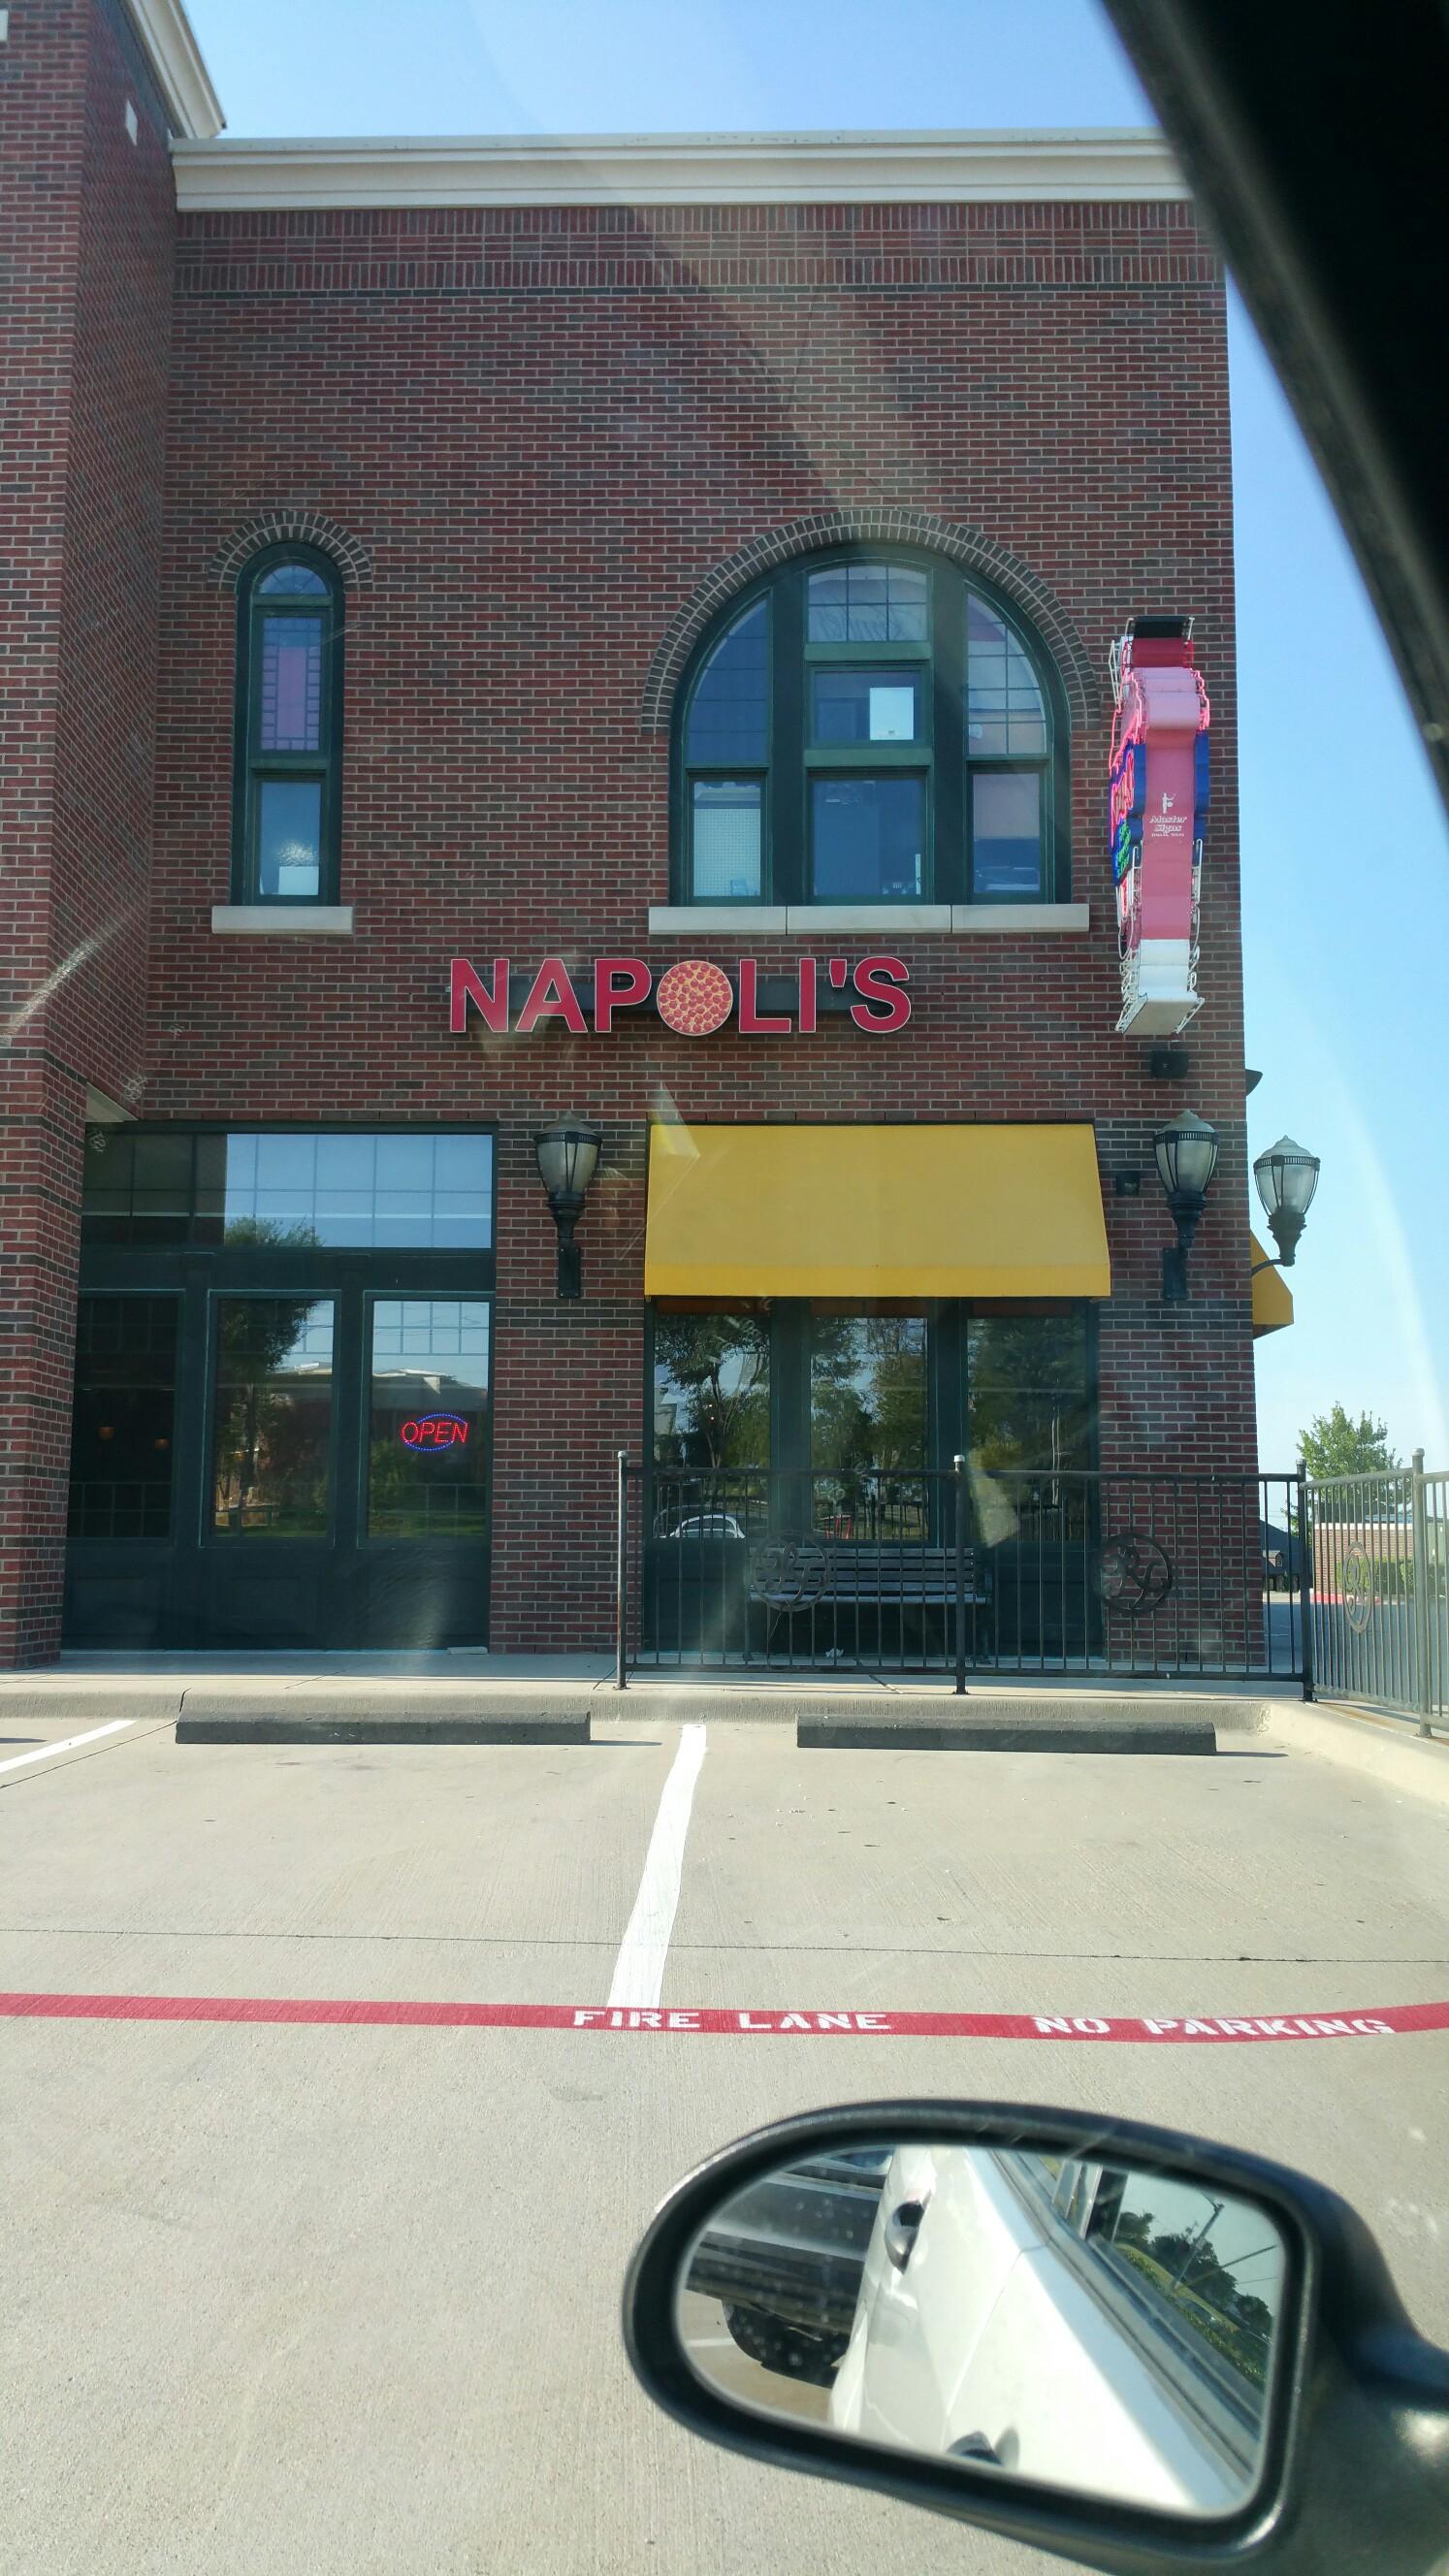 Napolis Family Restaurant & Pizza, Mansfield TX